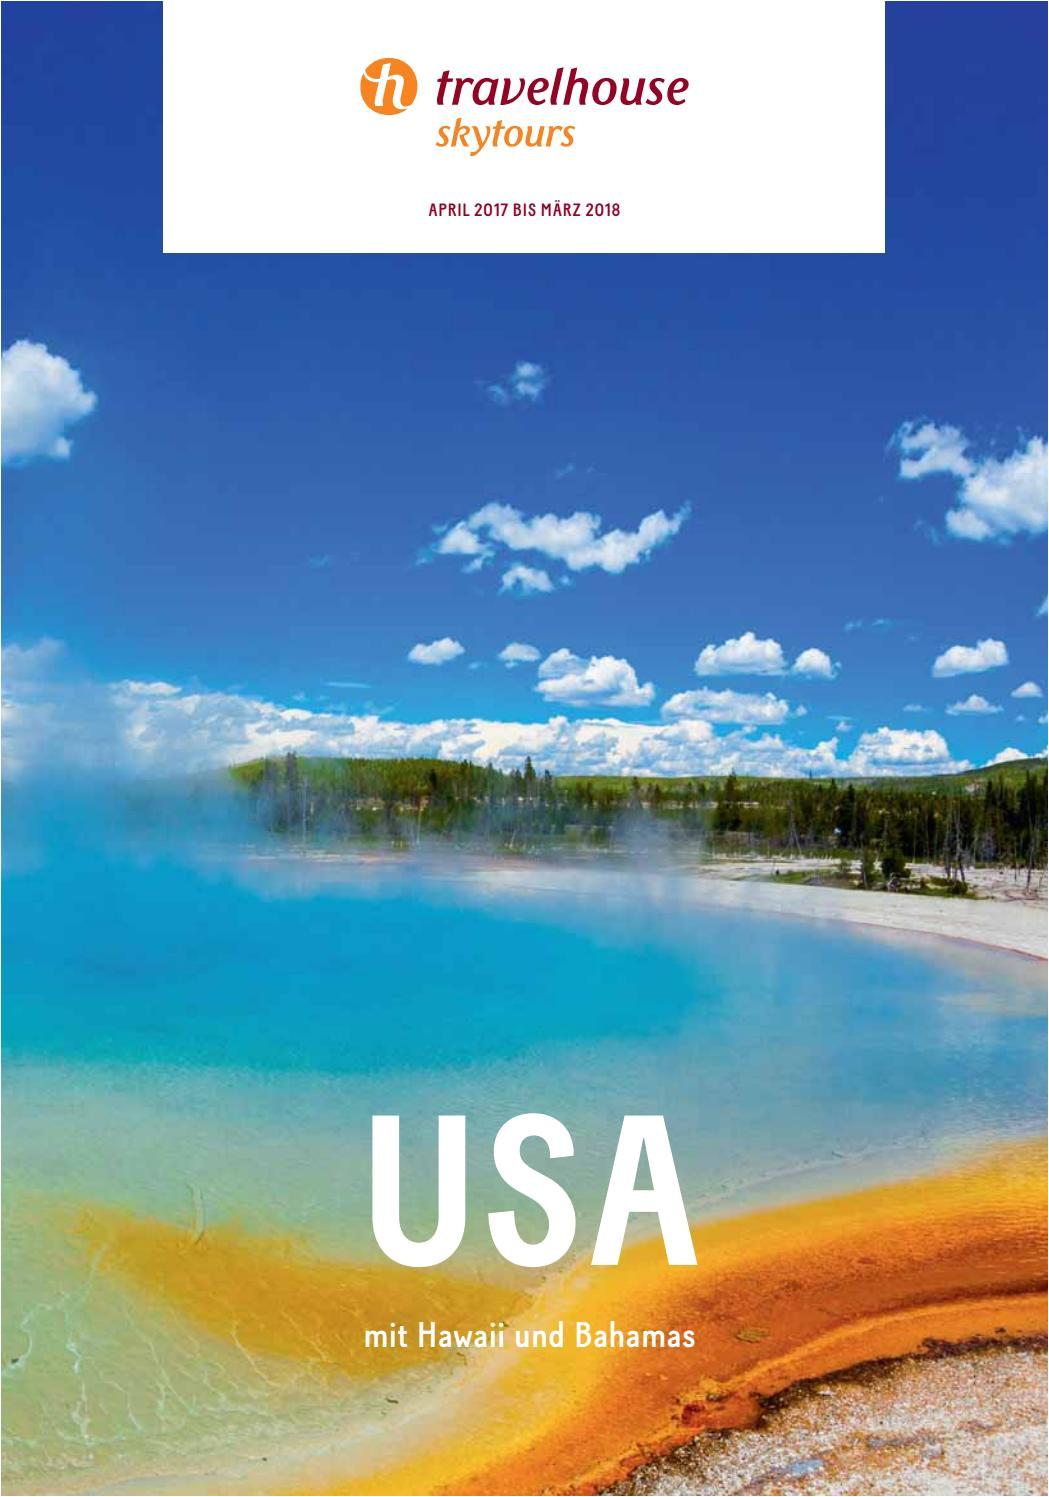 Texas Sage Heavenly Cloud Travelhouse Usa Von April 2017 Bis Marz 2018 by Hotelplan Suisse